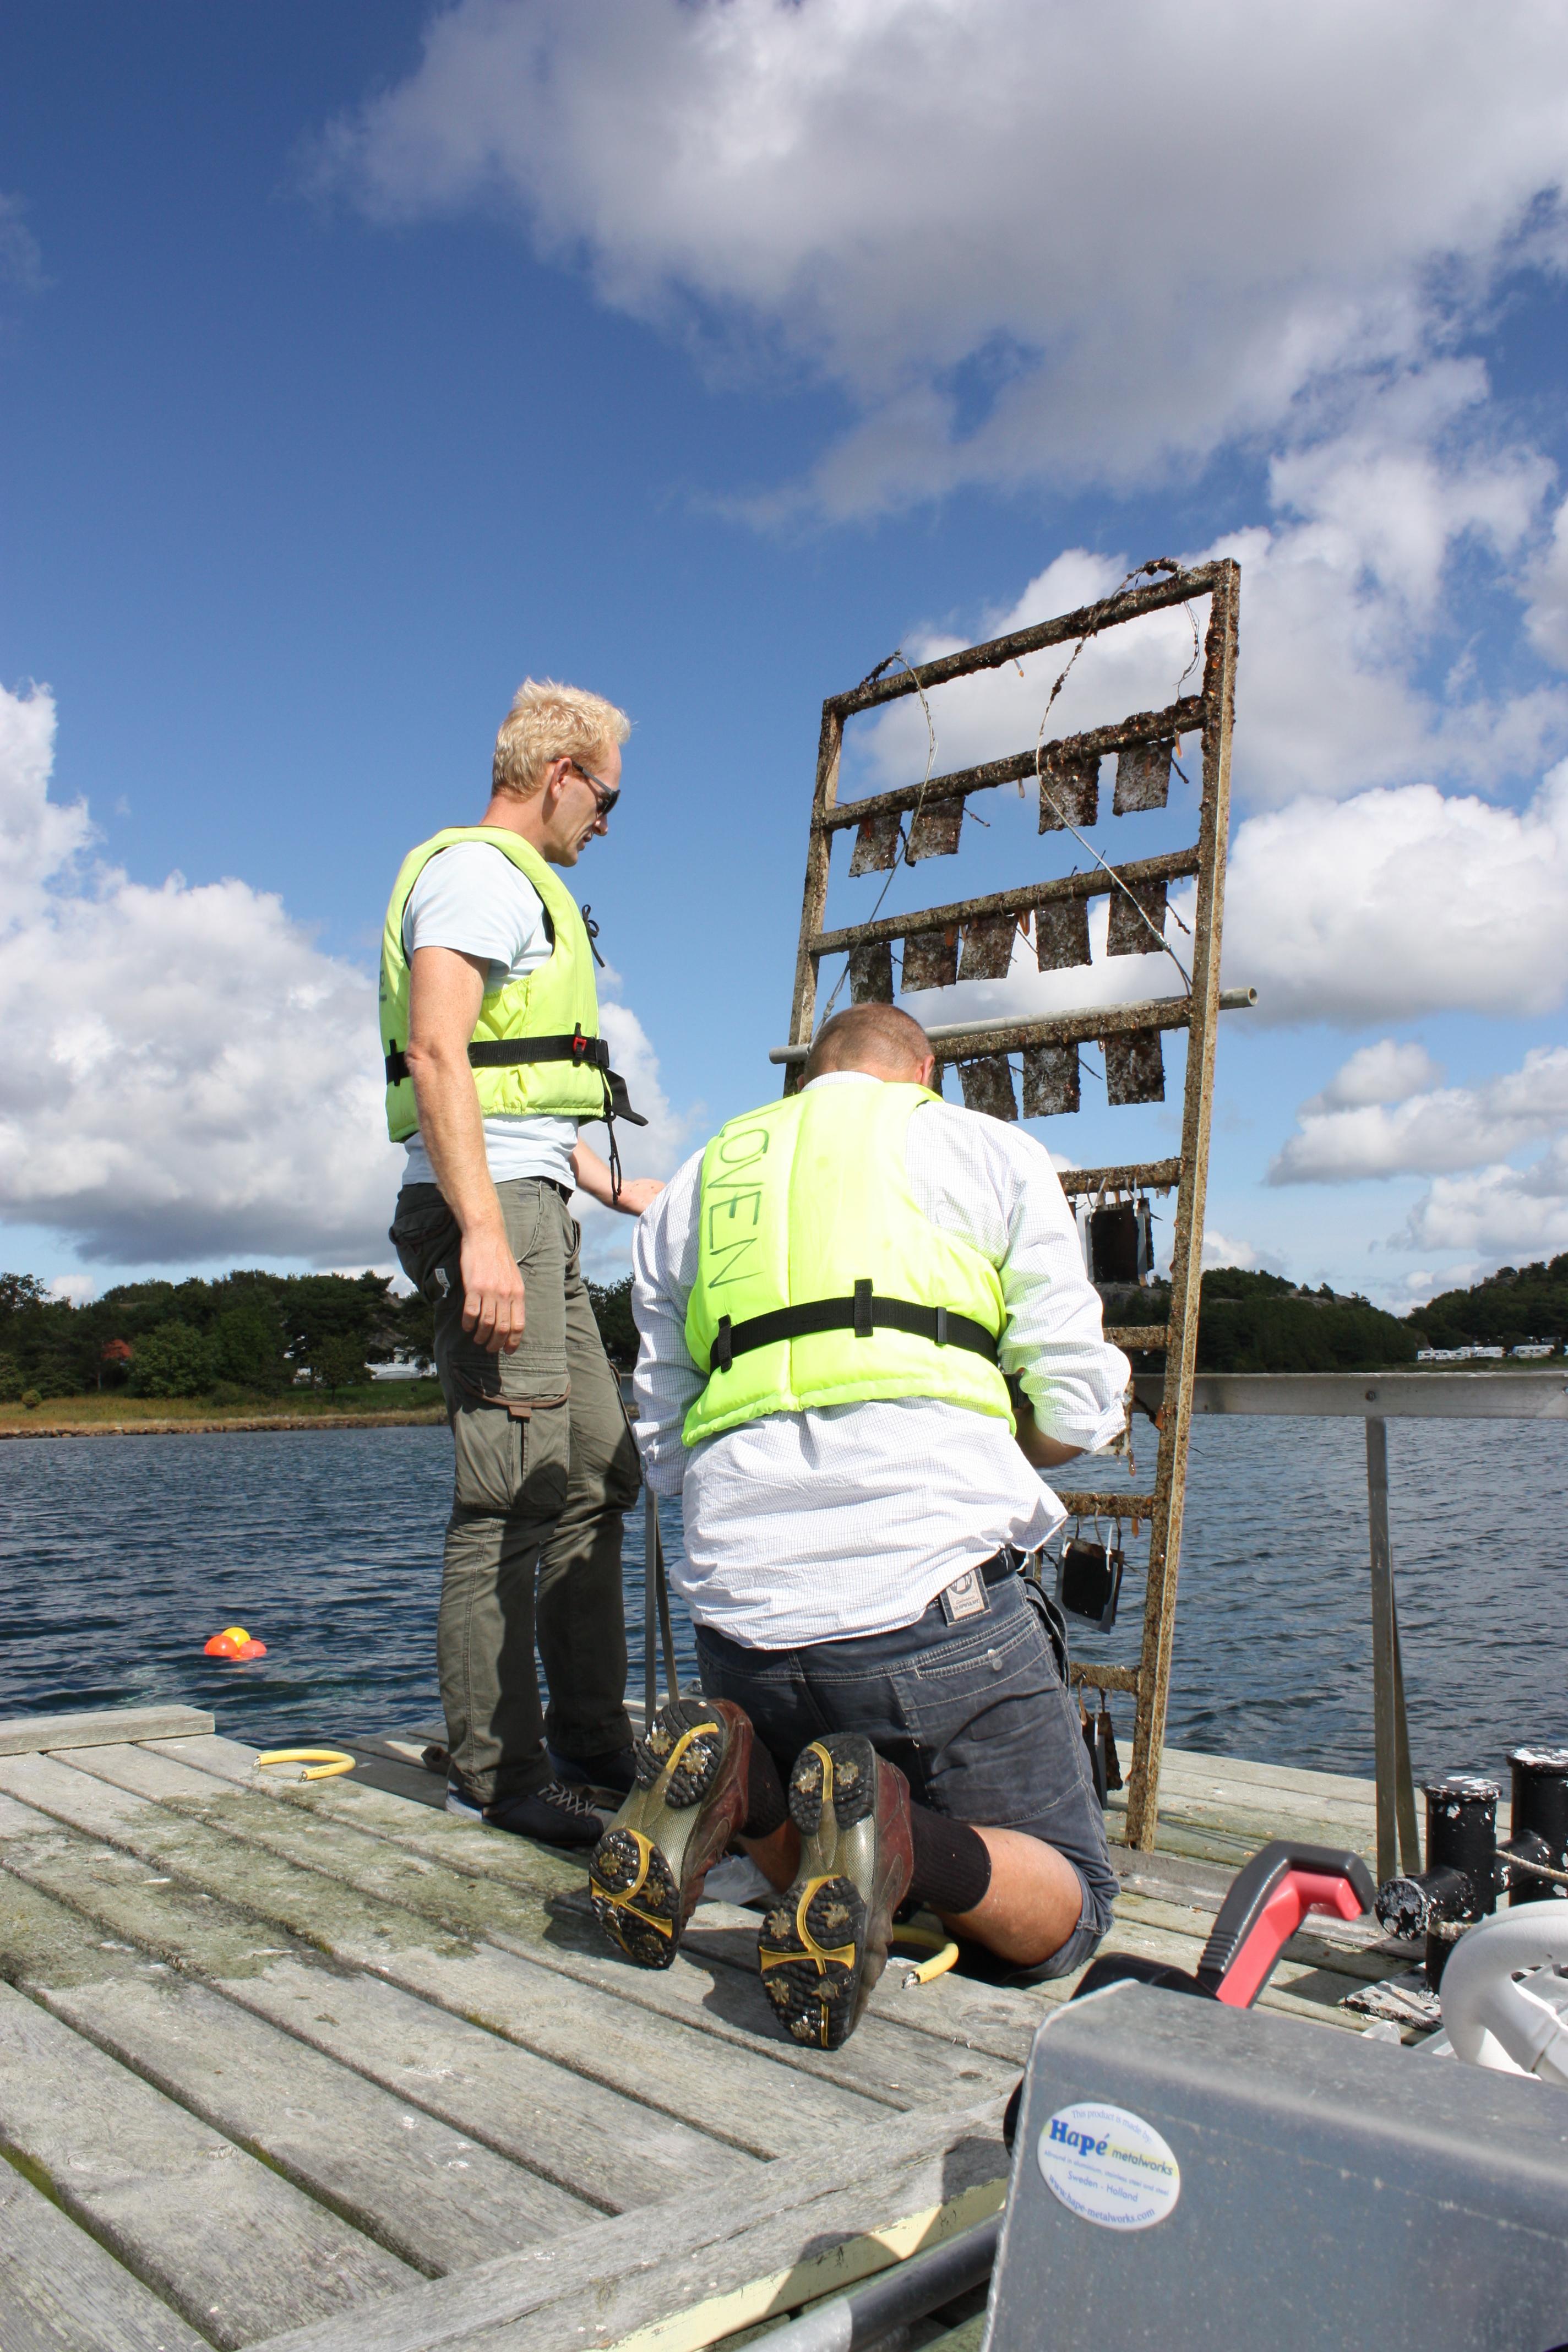 Sweden Field Test Site